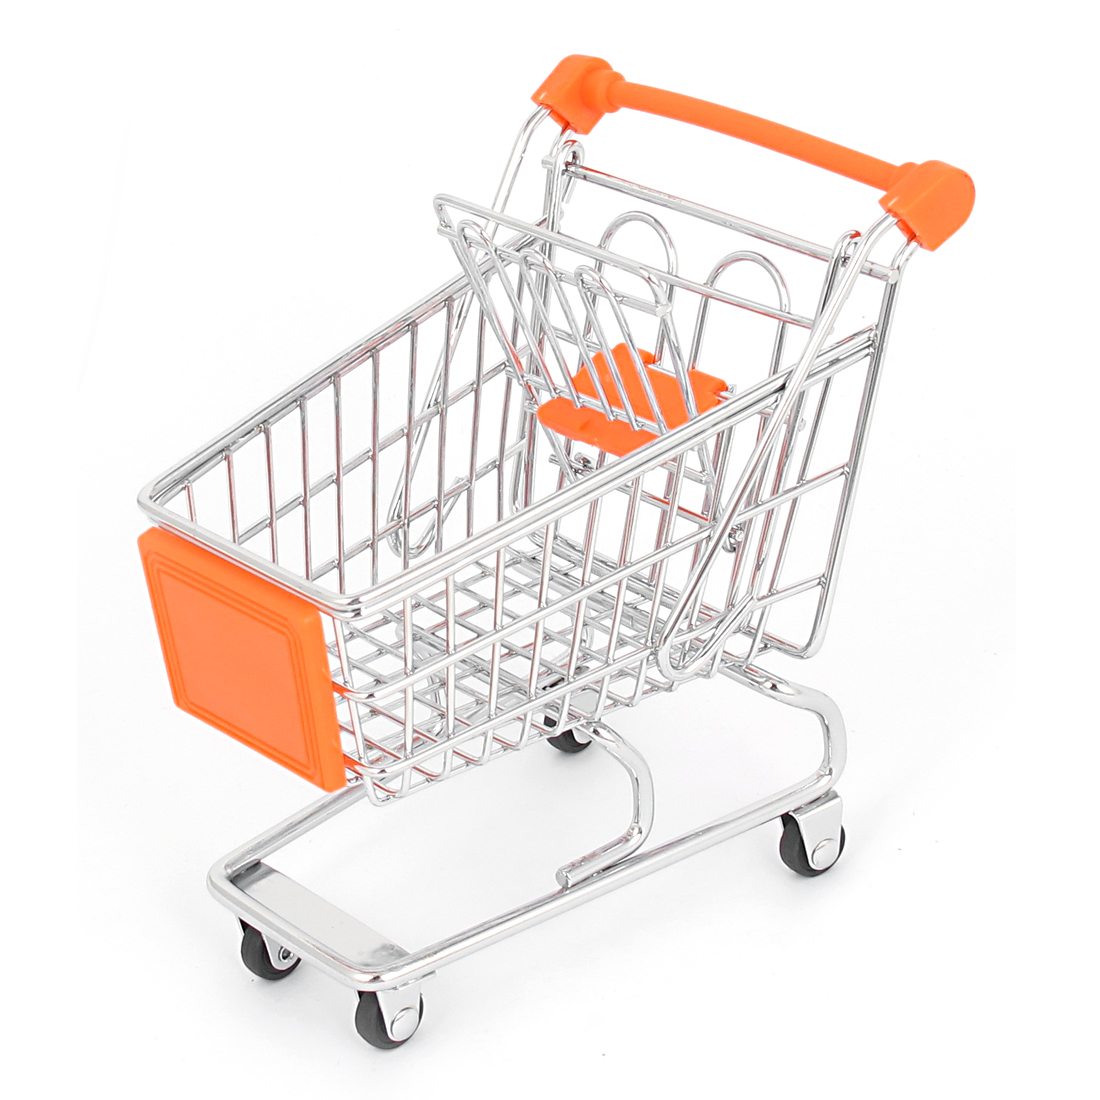 Stainless Steel Supermarket Mini-Shopping Handcart Shopping Utility Cart Mode Orange